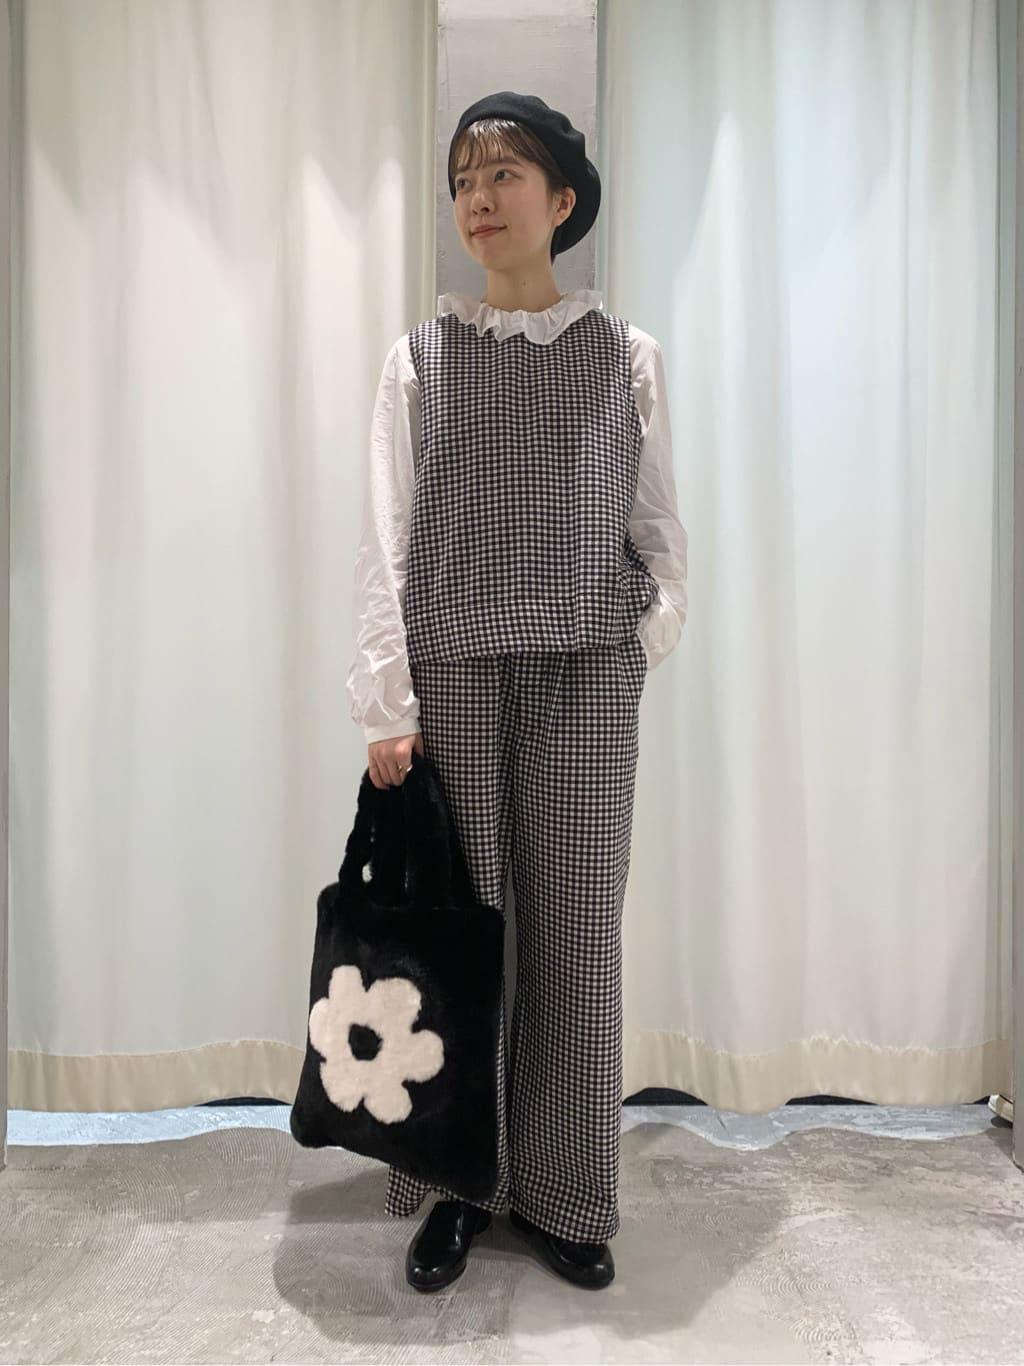 - CHILD WOMAN CHILD WOMAN , PAR ICI ルミネ横浜 身長:158cm 2021.09.10